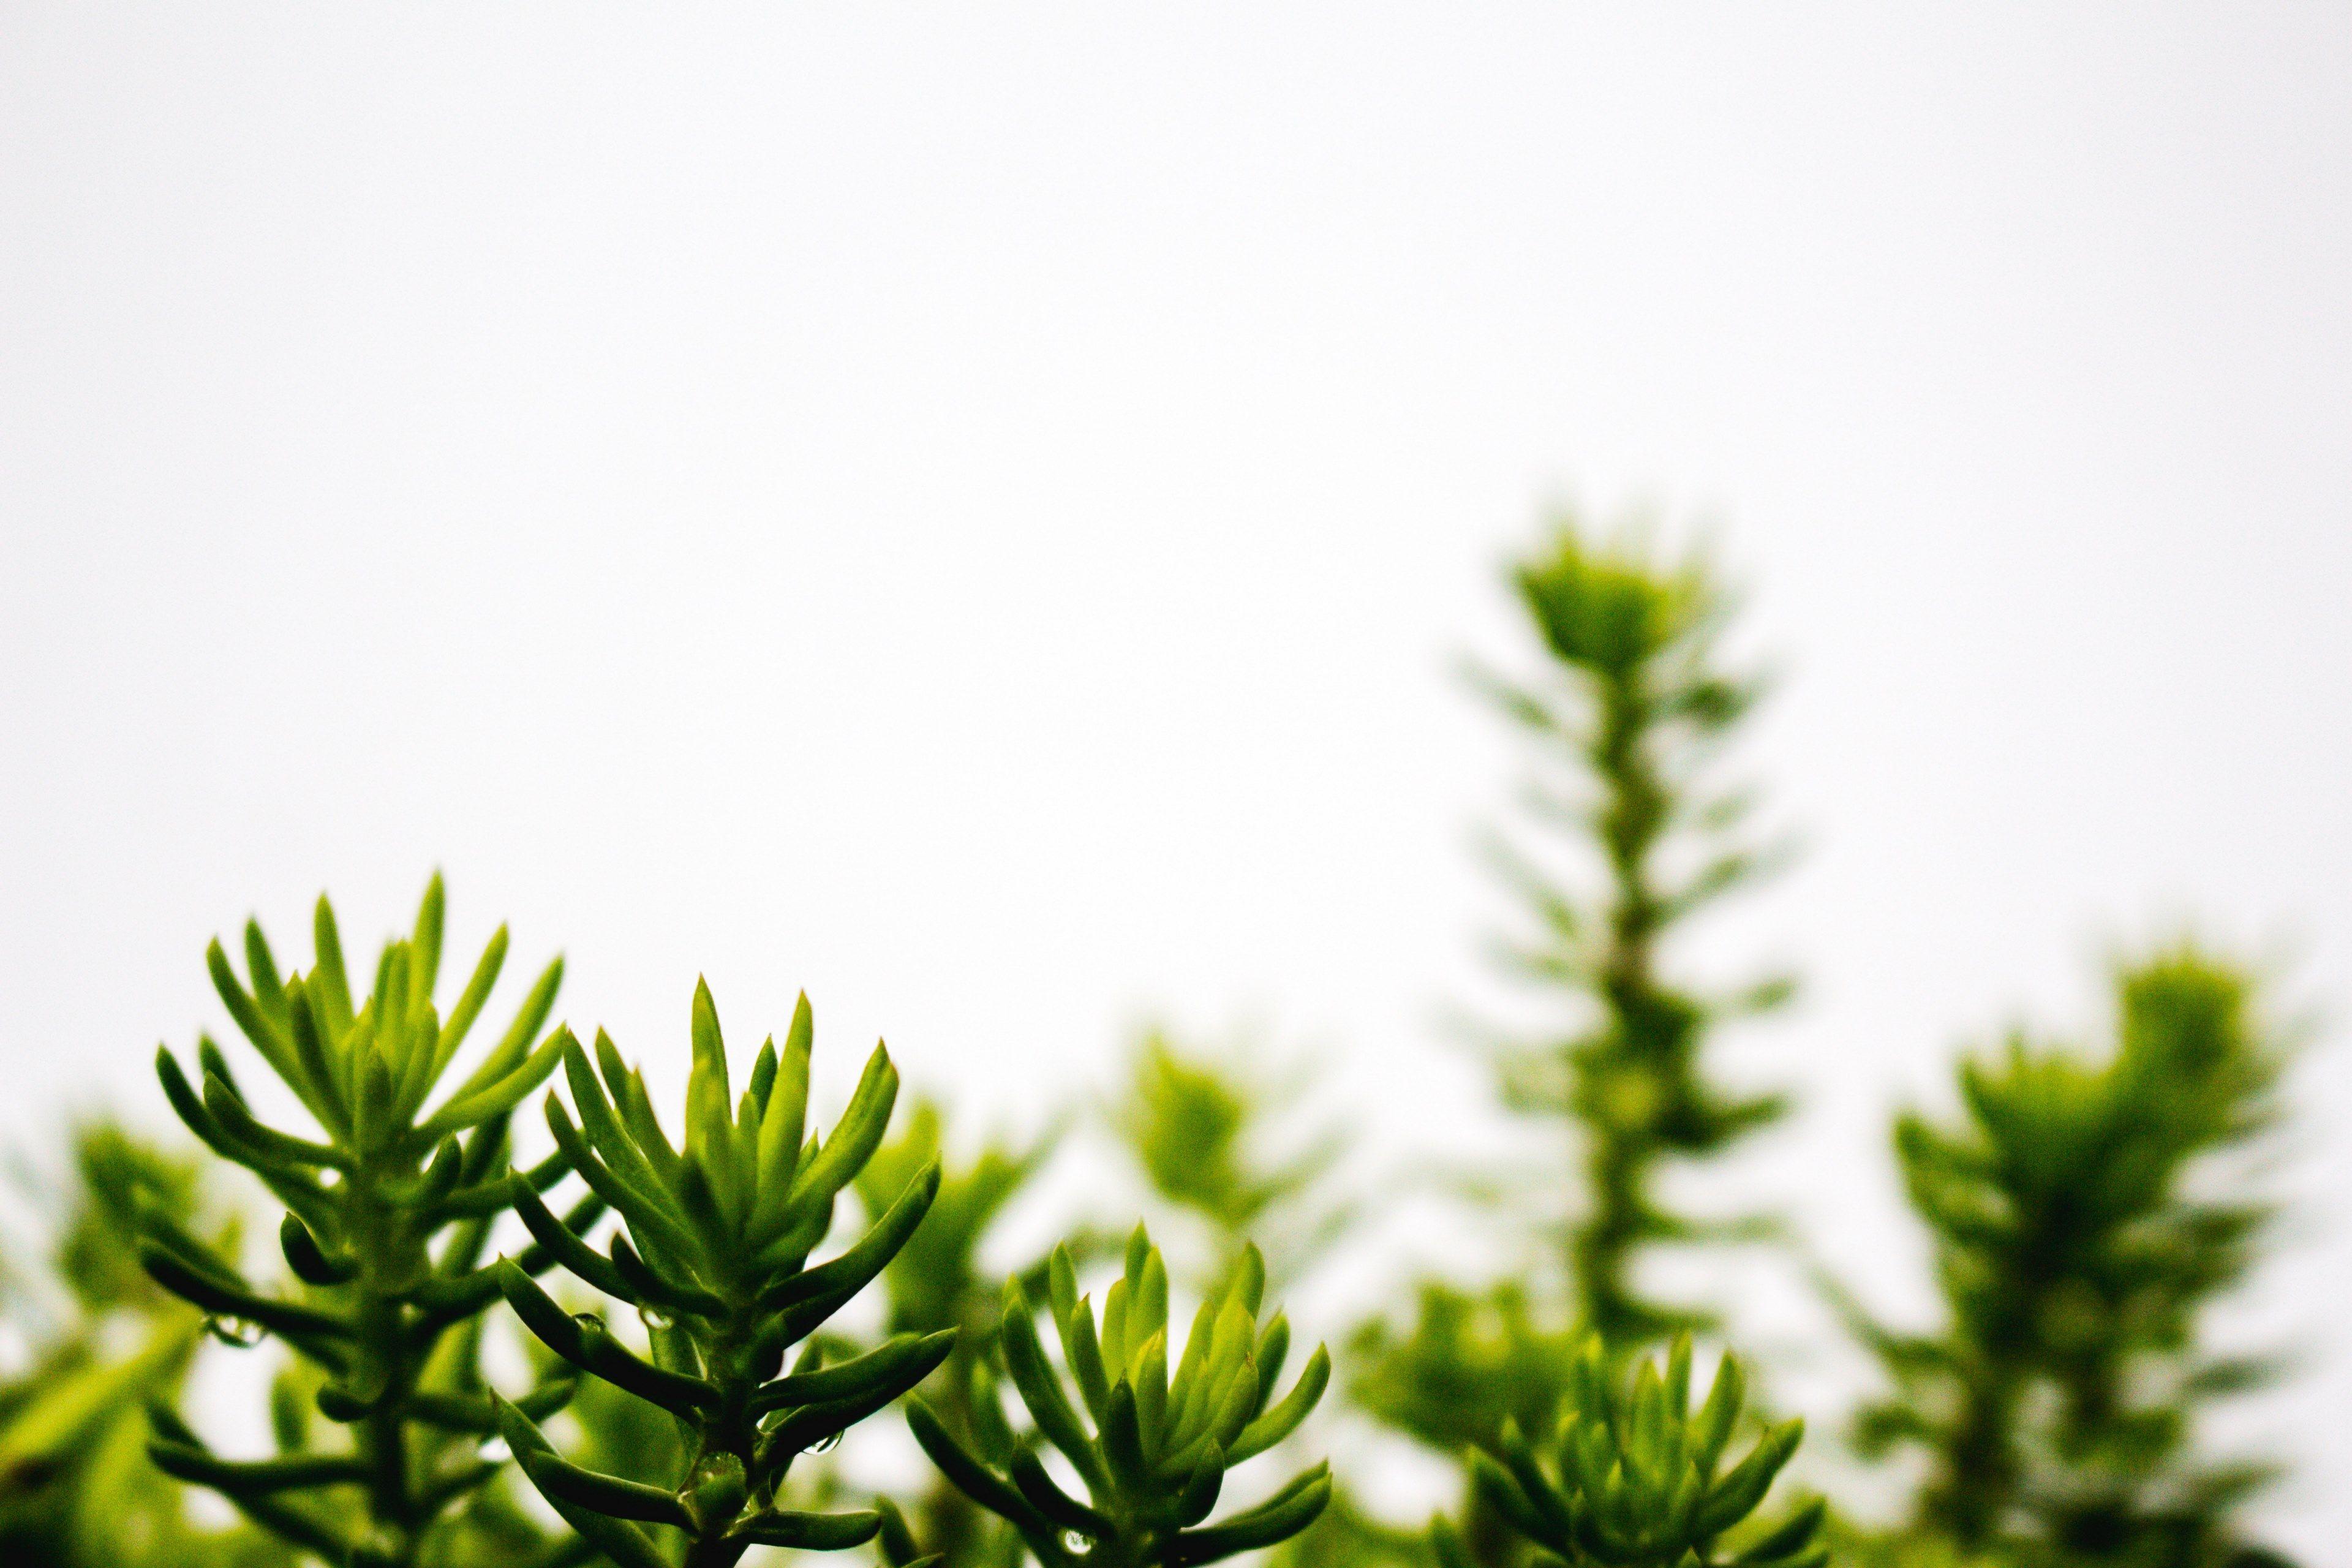 Clean Greenery Desktop Wallpapers - Wallpaper Cave